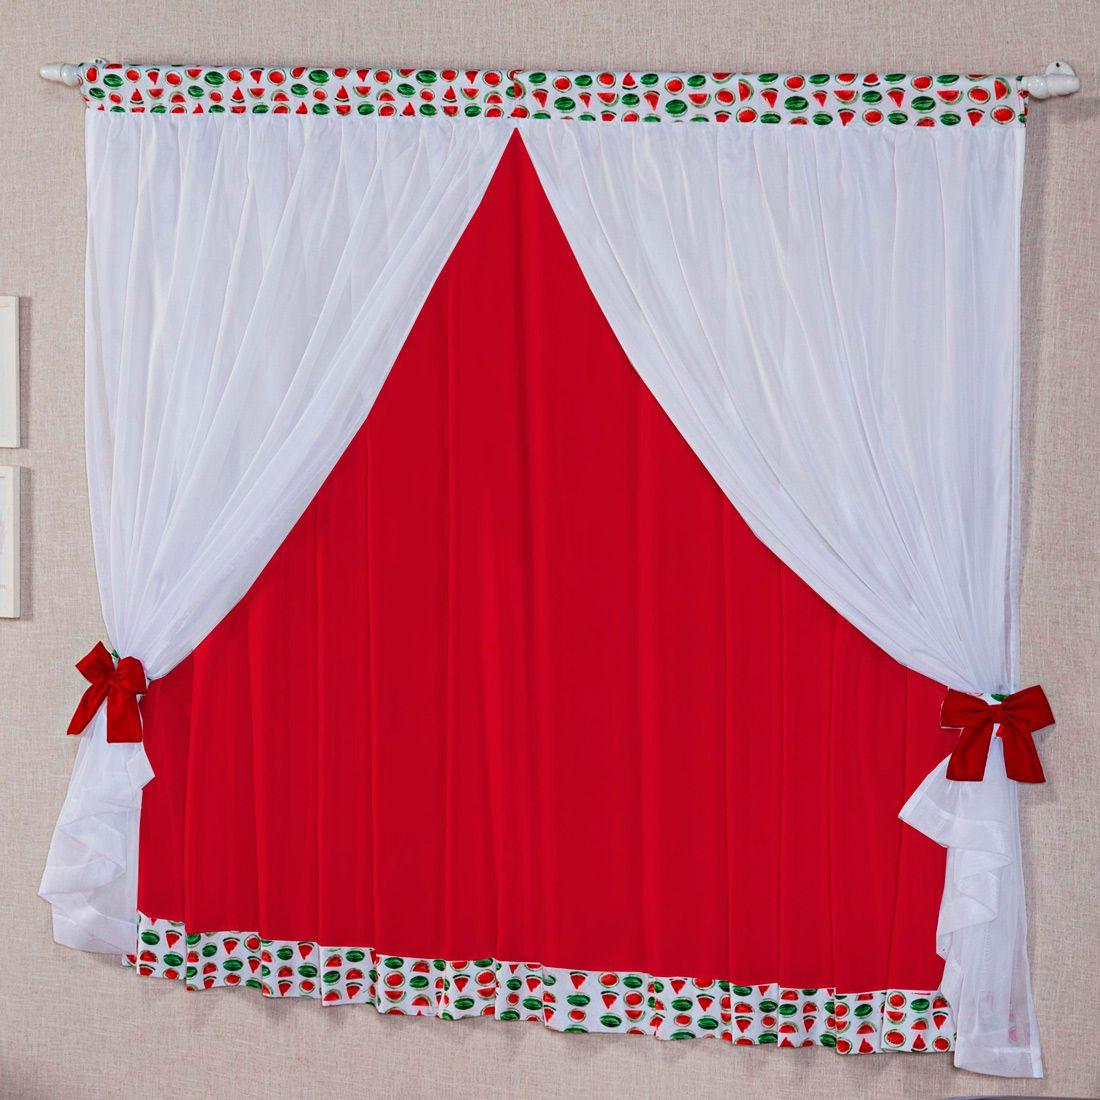 Cortina Melancia Branco/Vermelho c/ Voil 2,00m x 1,70m p/ Varão Simples